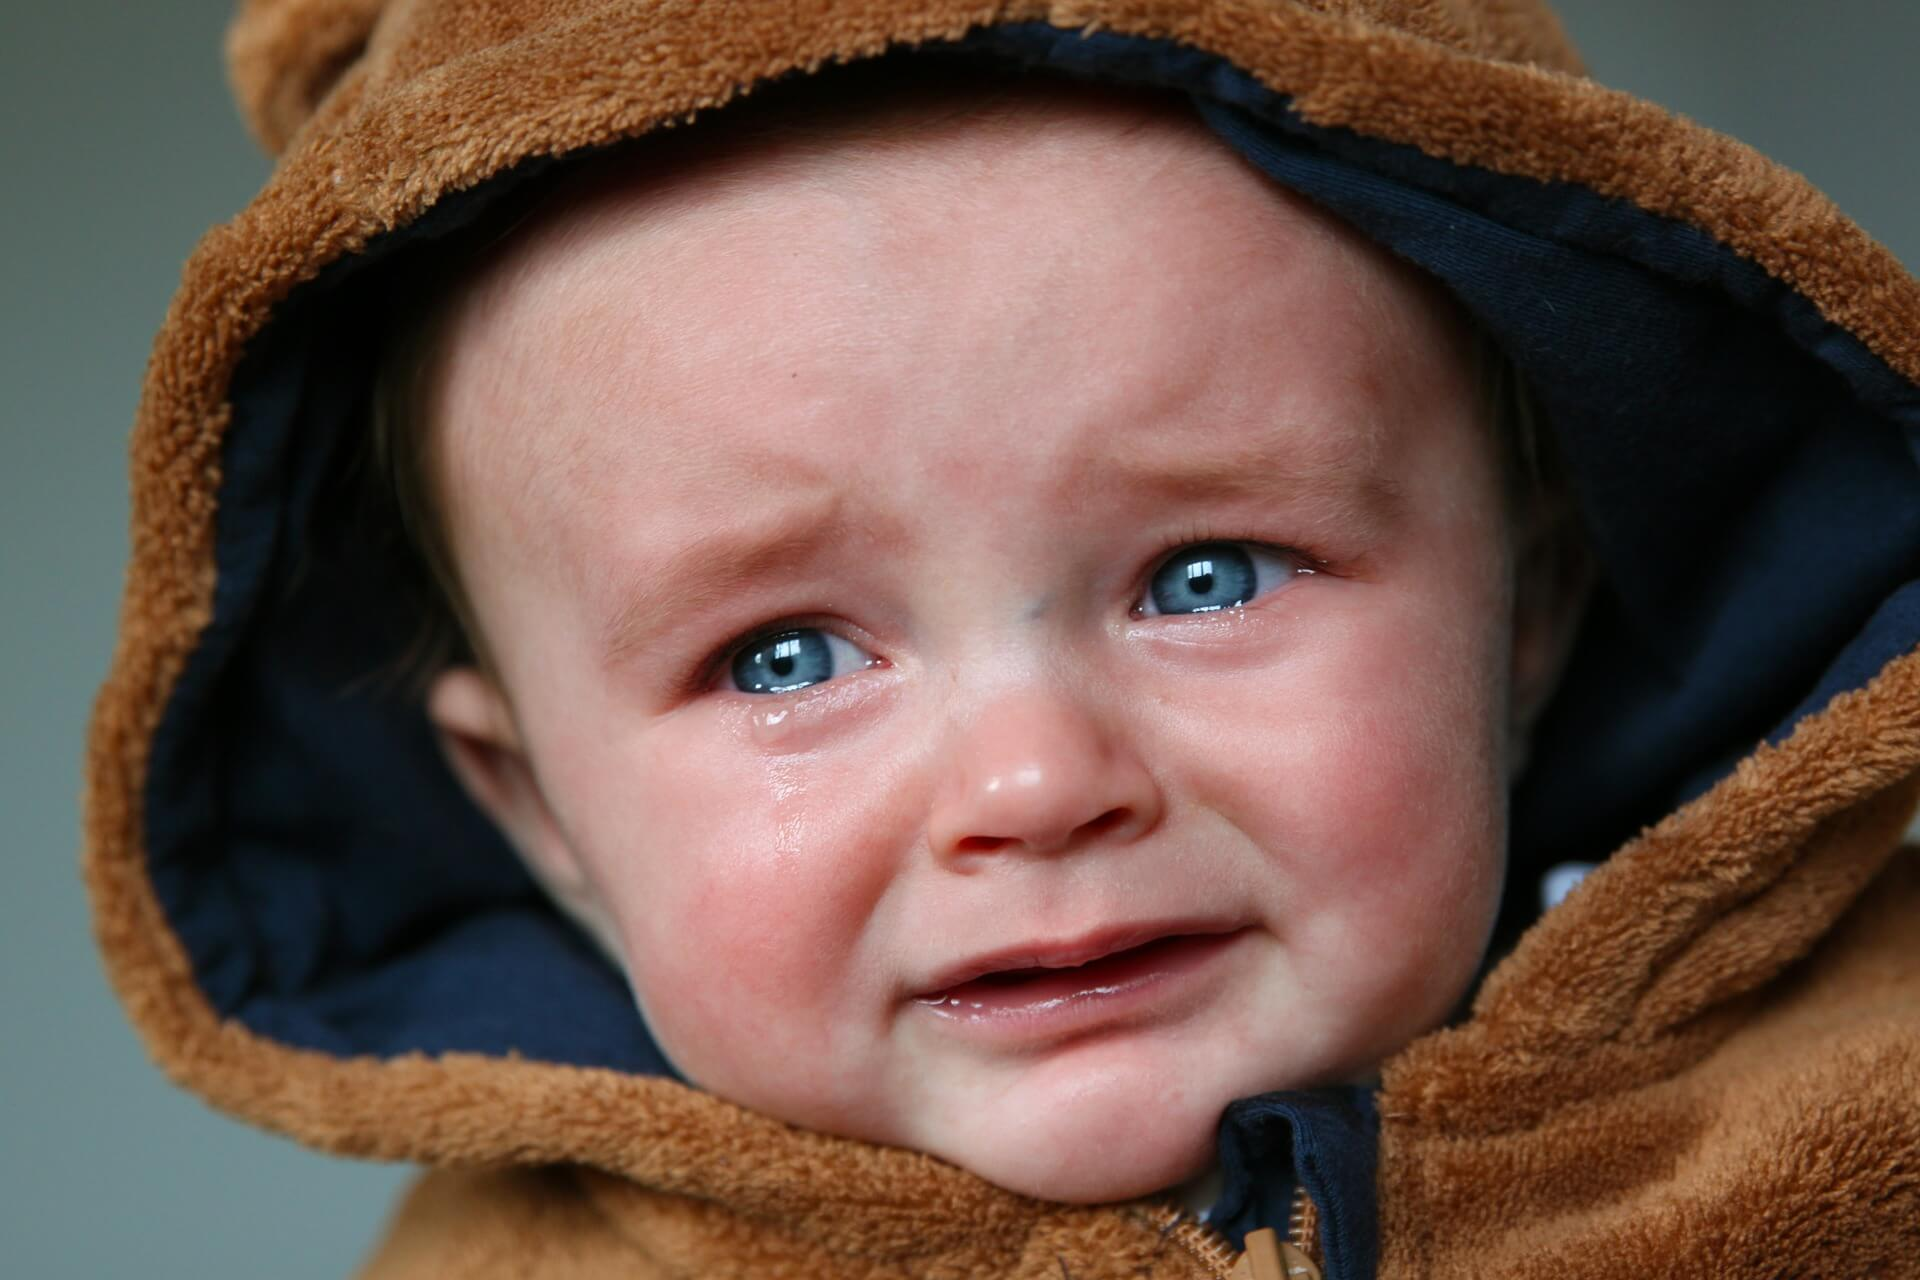 Nino llorando con capucha marron